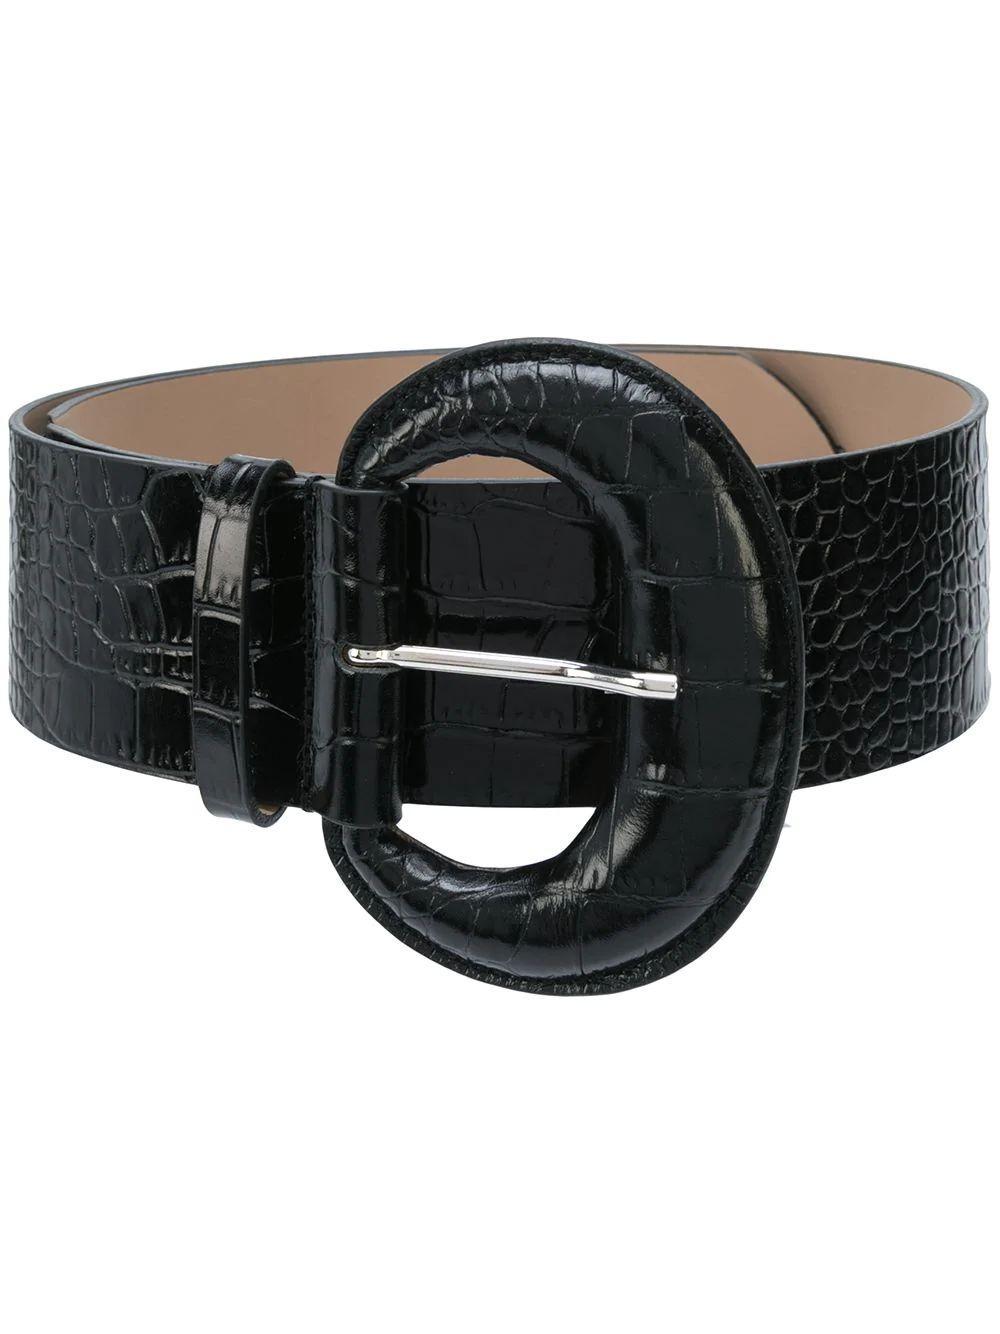 Maura Crocodile Belt Item # BW578-710LE-F20